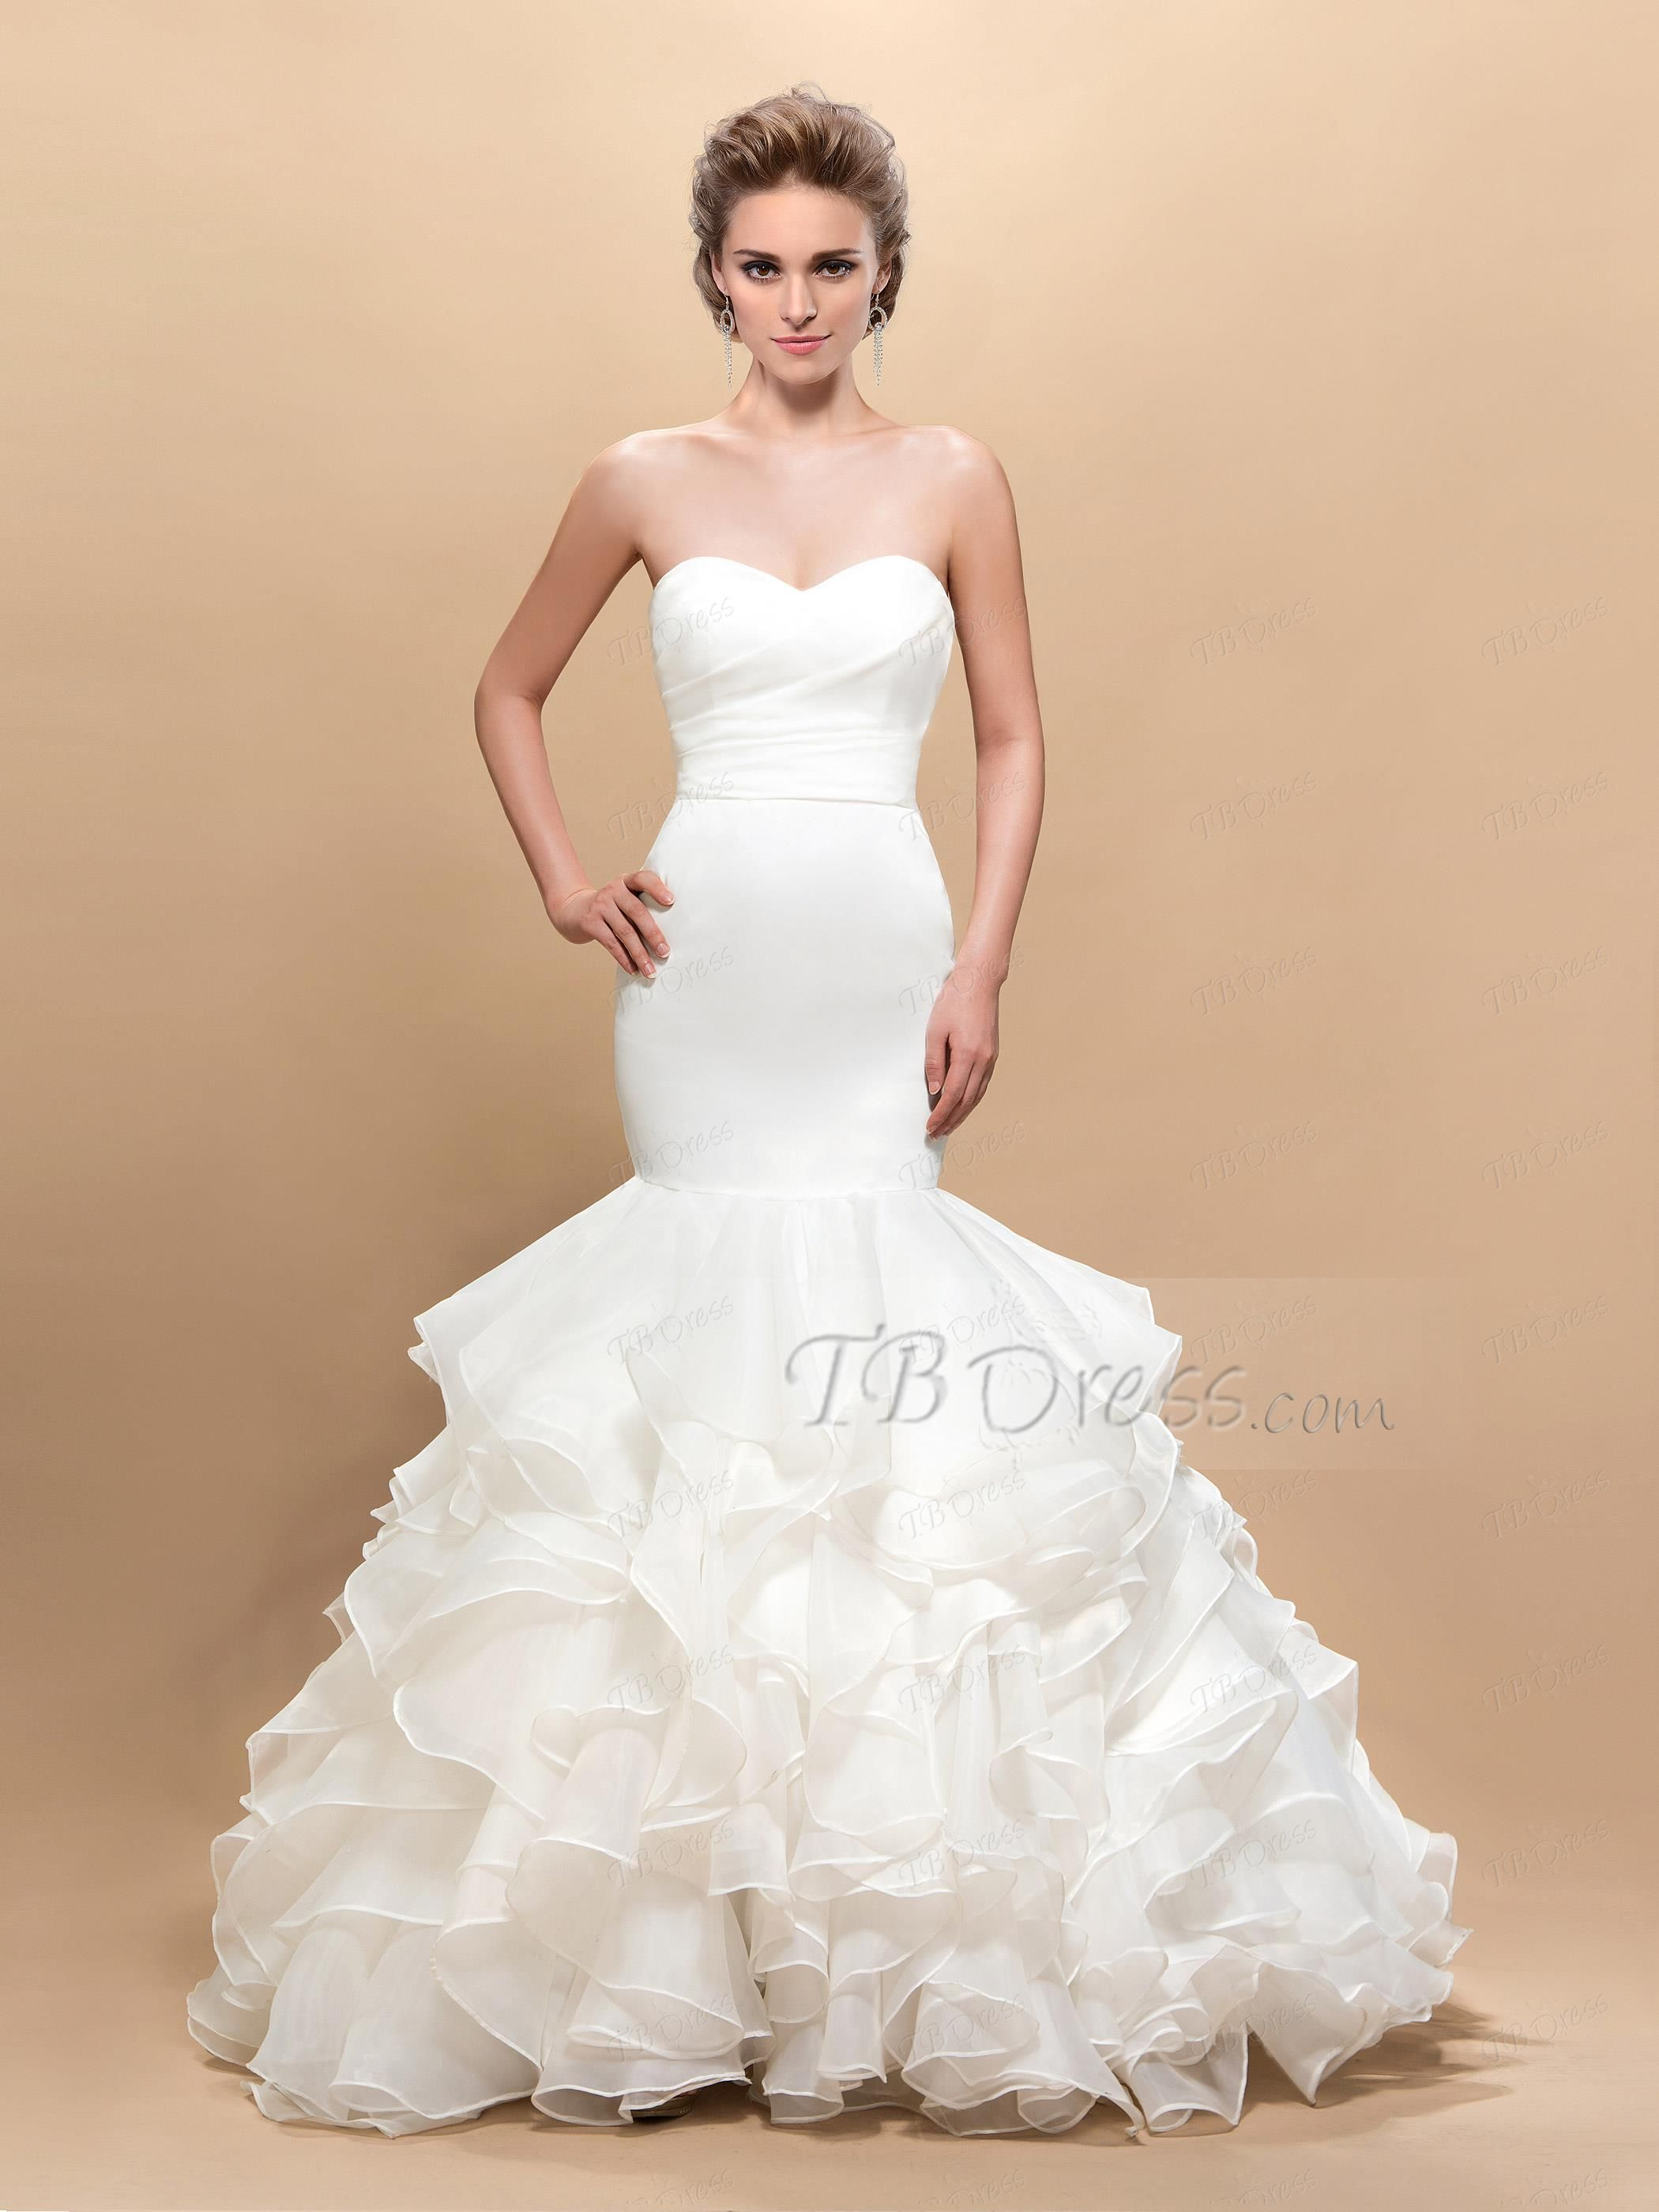 Sweetheart strapless wedding dress  Sweetheart Trumpet Pleats FloorLength Wedding Dress  Trumpets